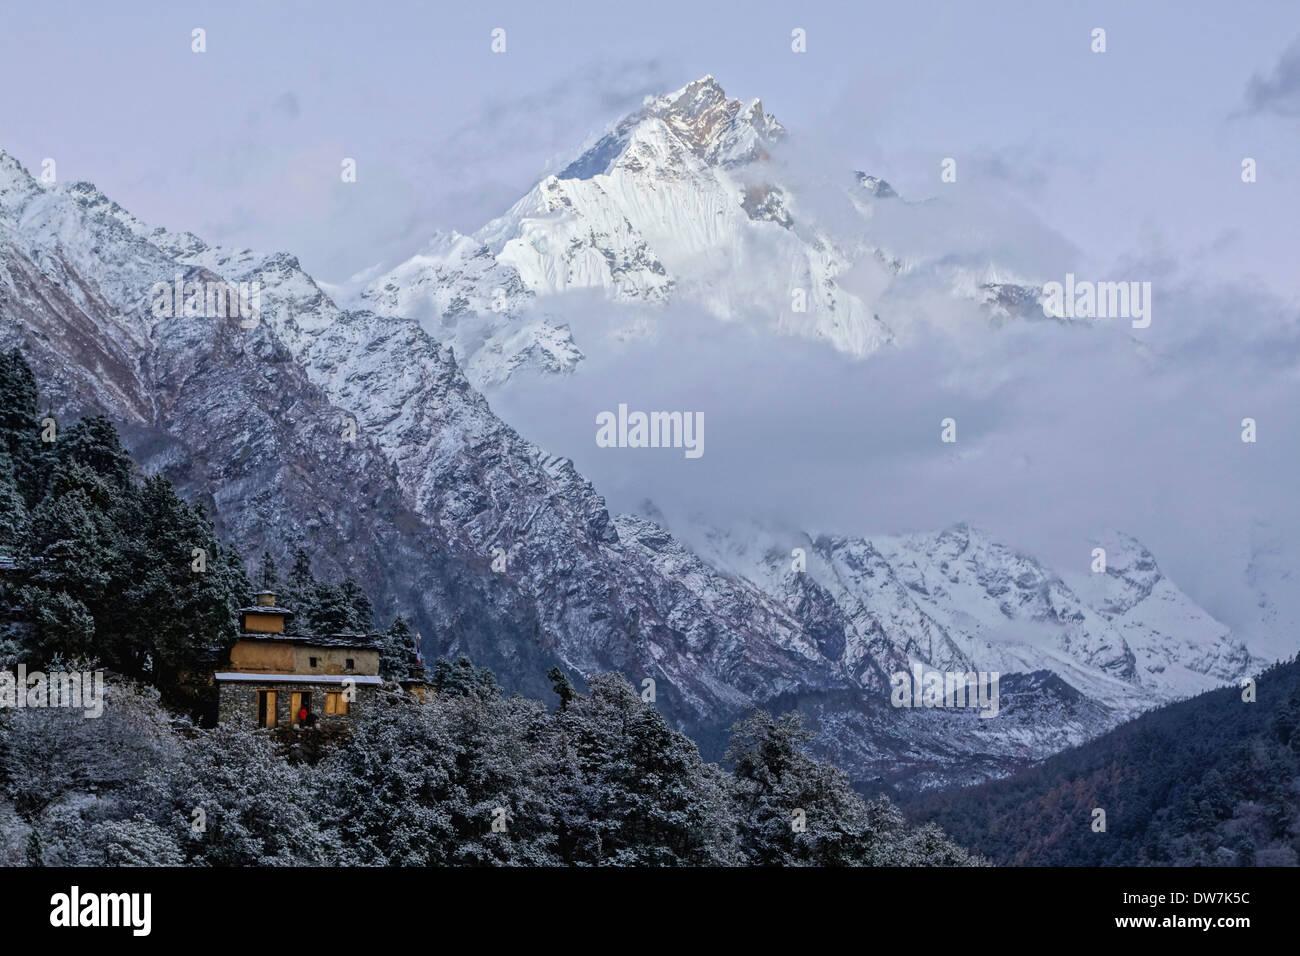 Gumba Lungdang Monastery and peaks of the Ganesh Himal range, Nepal. - Stock Image